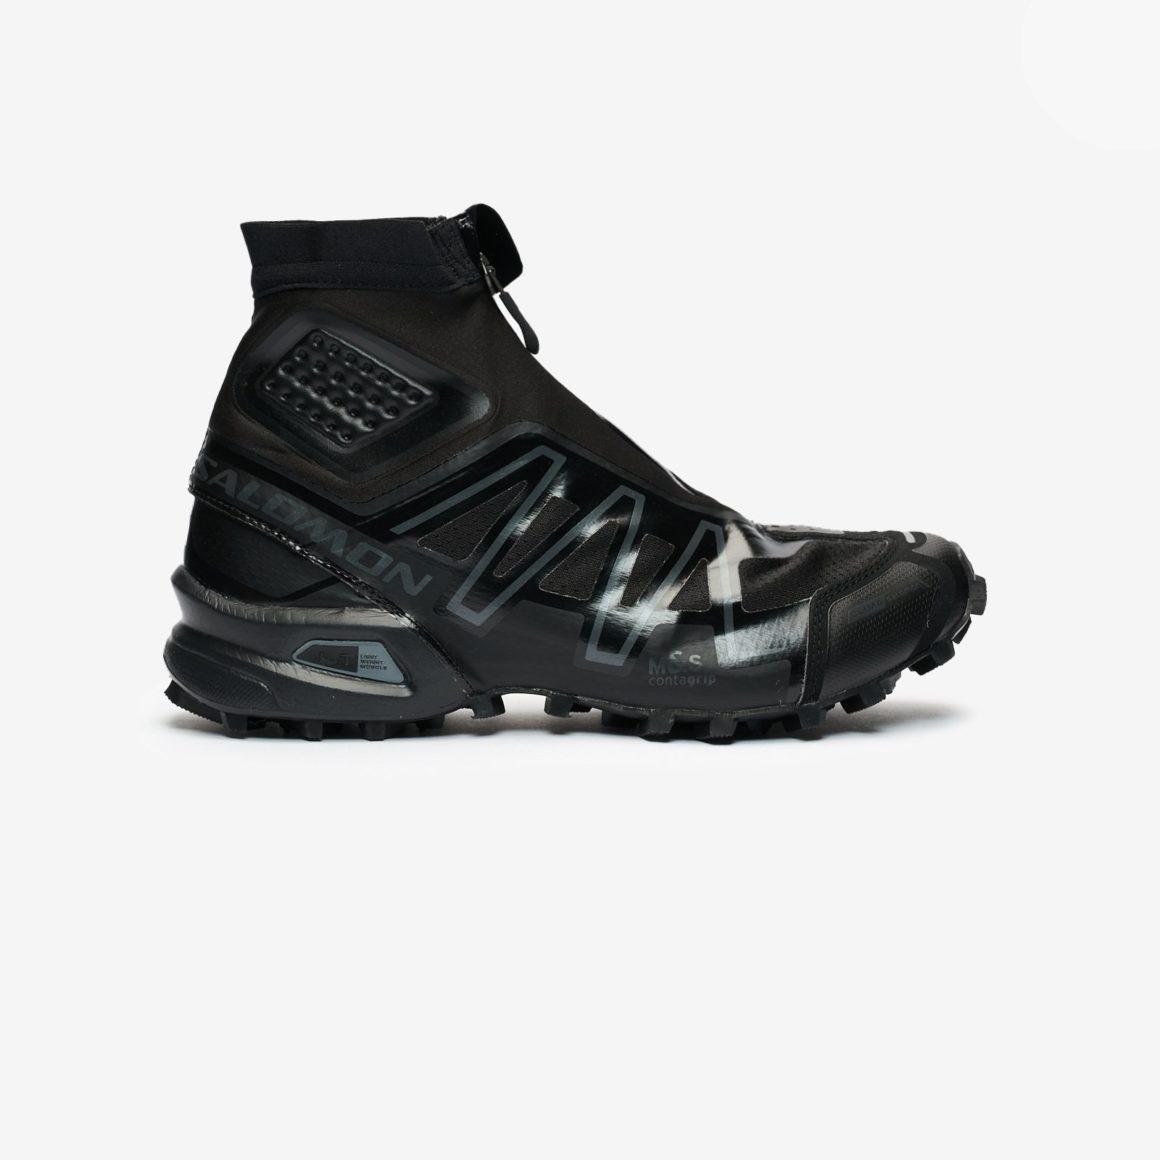 salomon-snowcross-advanced-l40636200